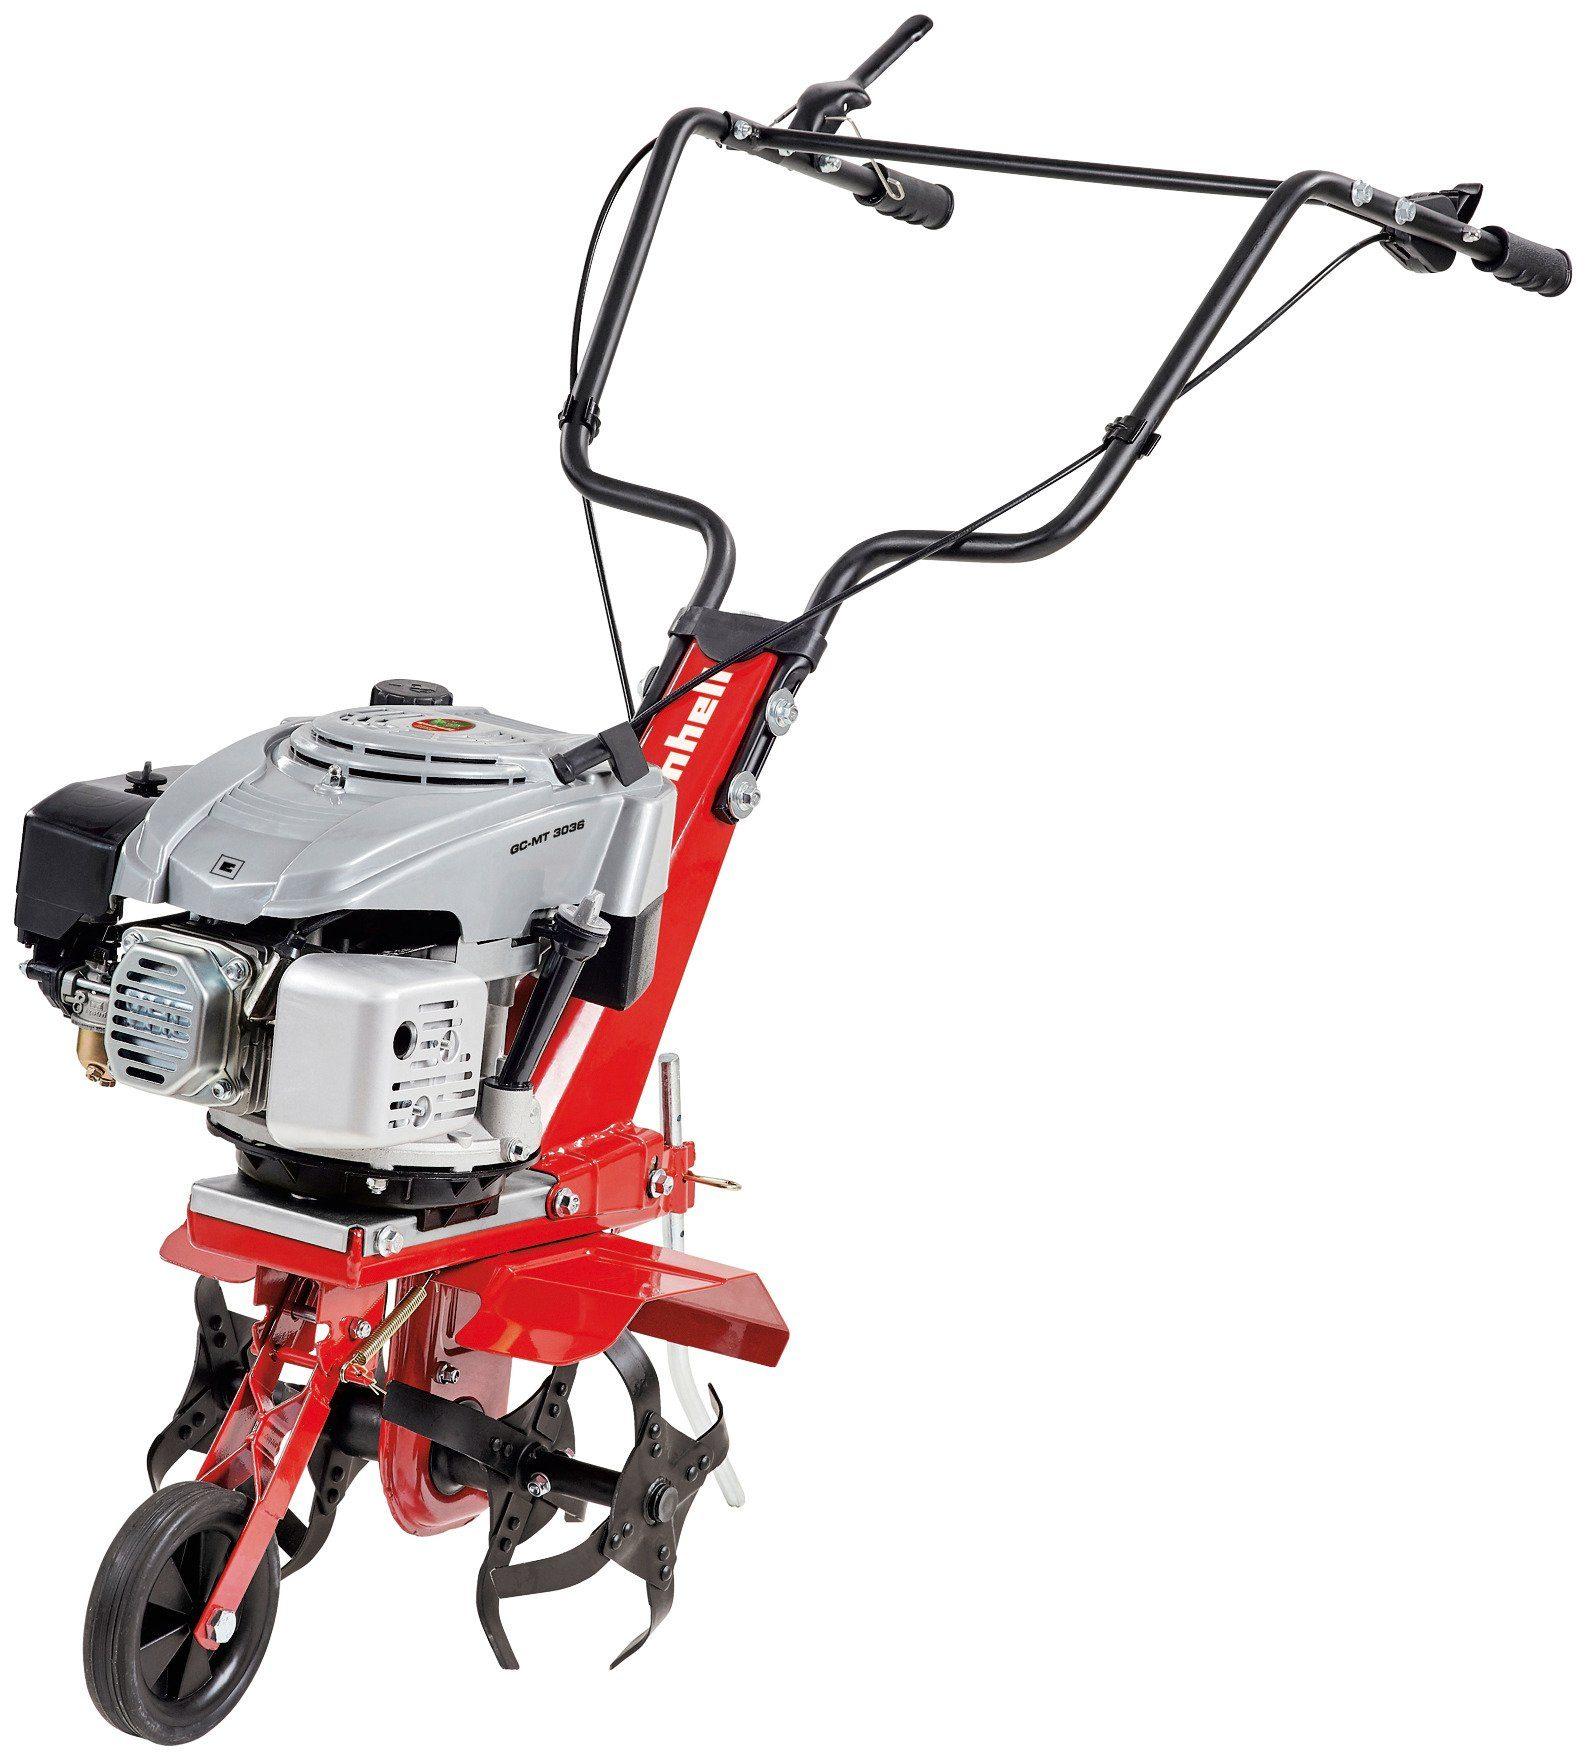 Motorhacke »GC-MT 3036«